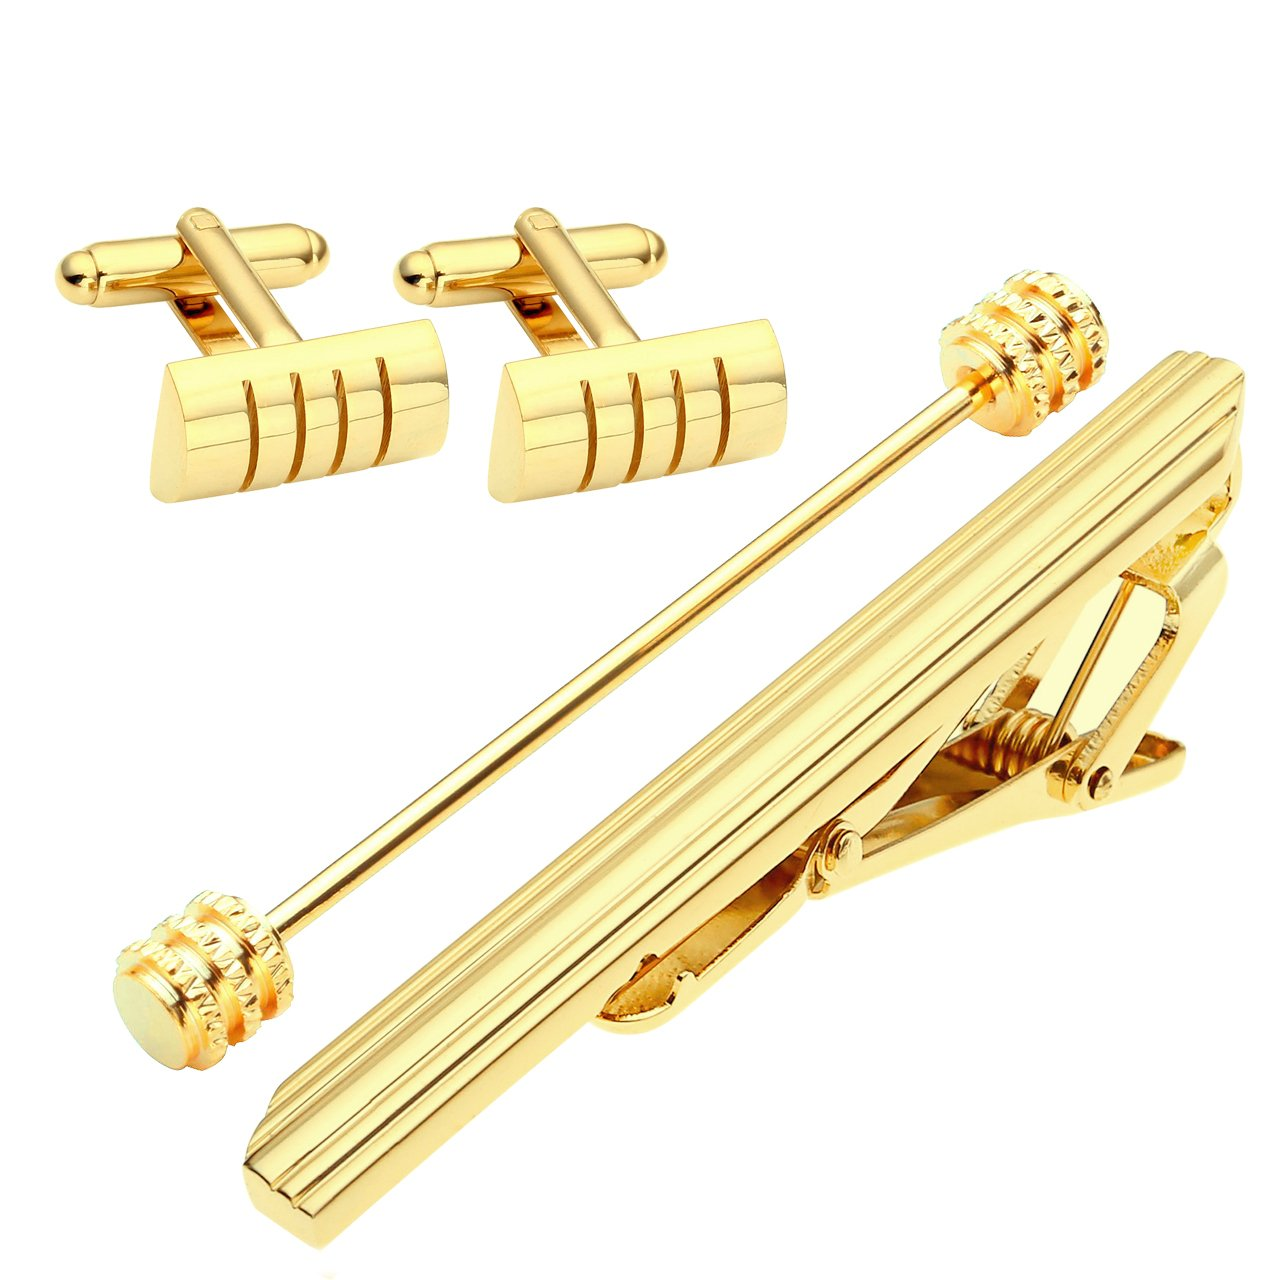 Zysta 4pcs Stainless Steel Men's Tie Clip + Cufflinks + Collar Bar Pin, Business Shirt Tie Clips Pins Necktie Clasp Lapel Stick Collar Brooch + Gift Box